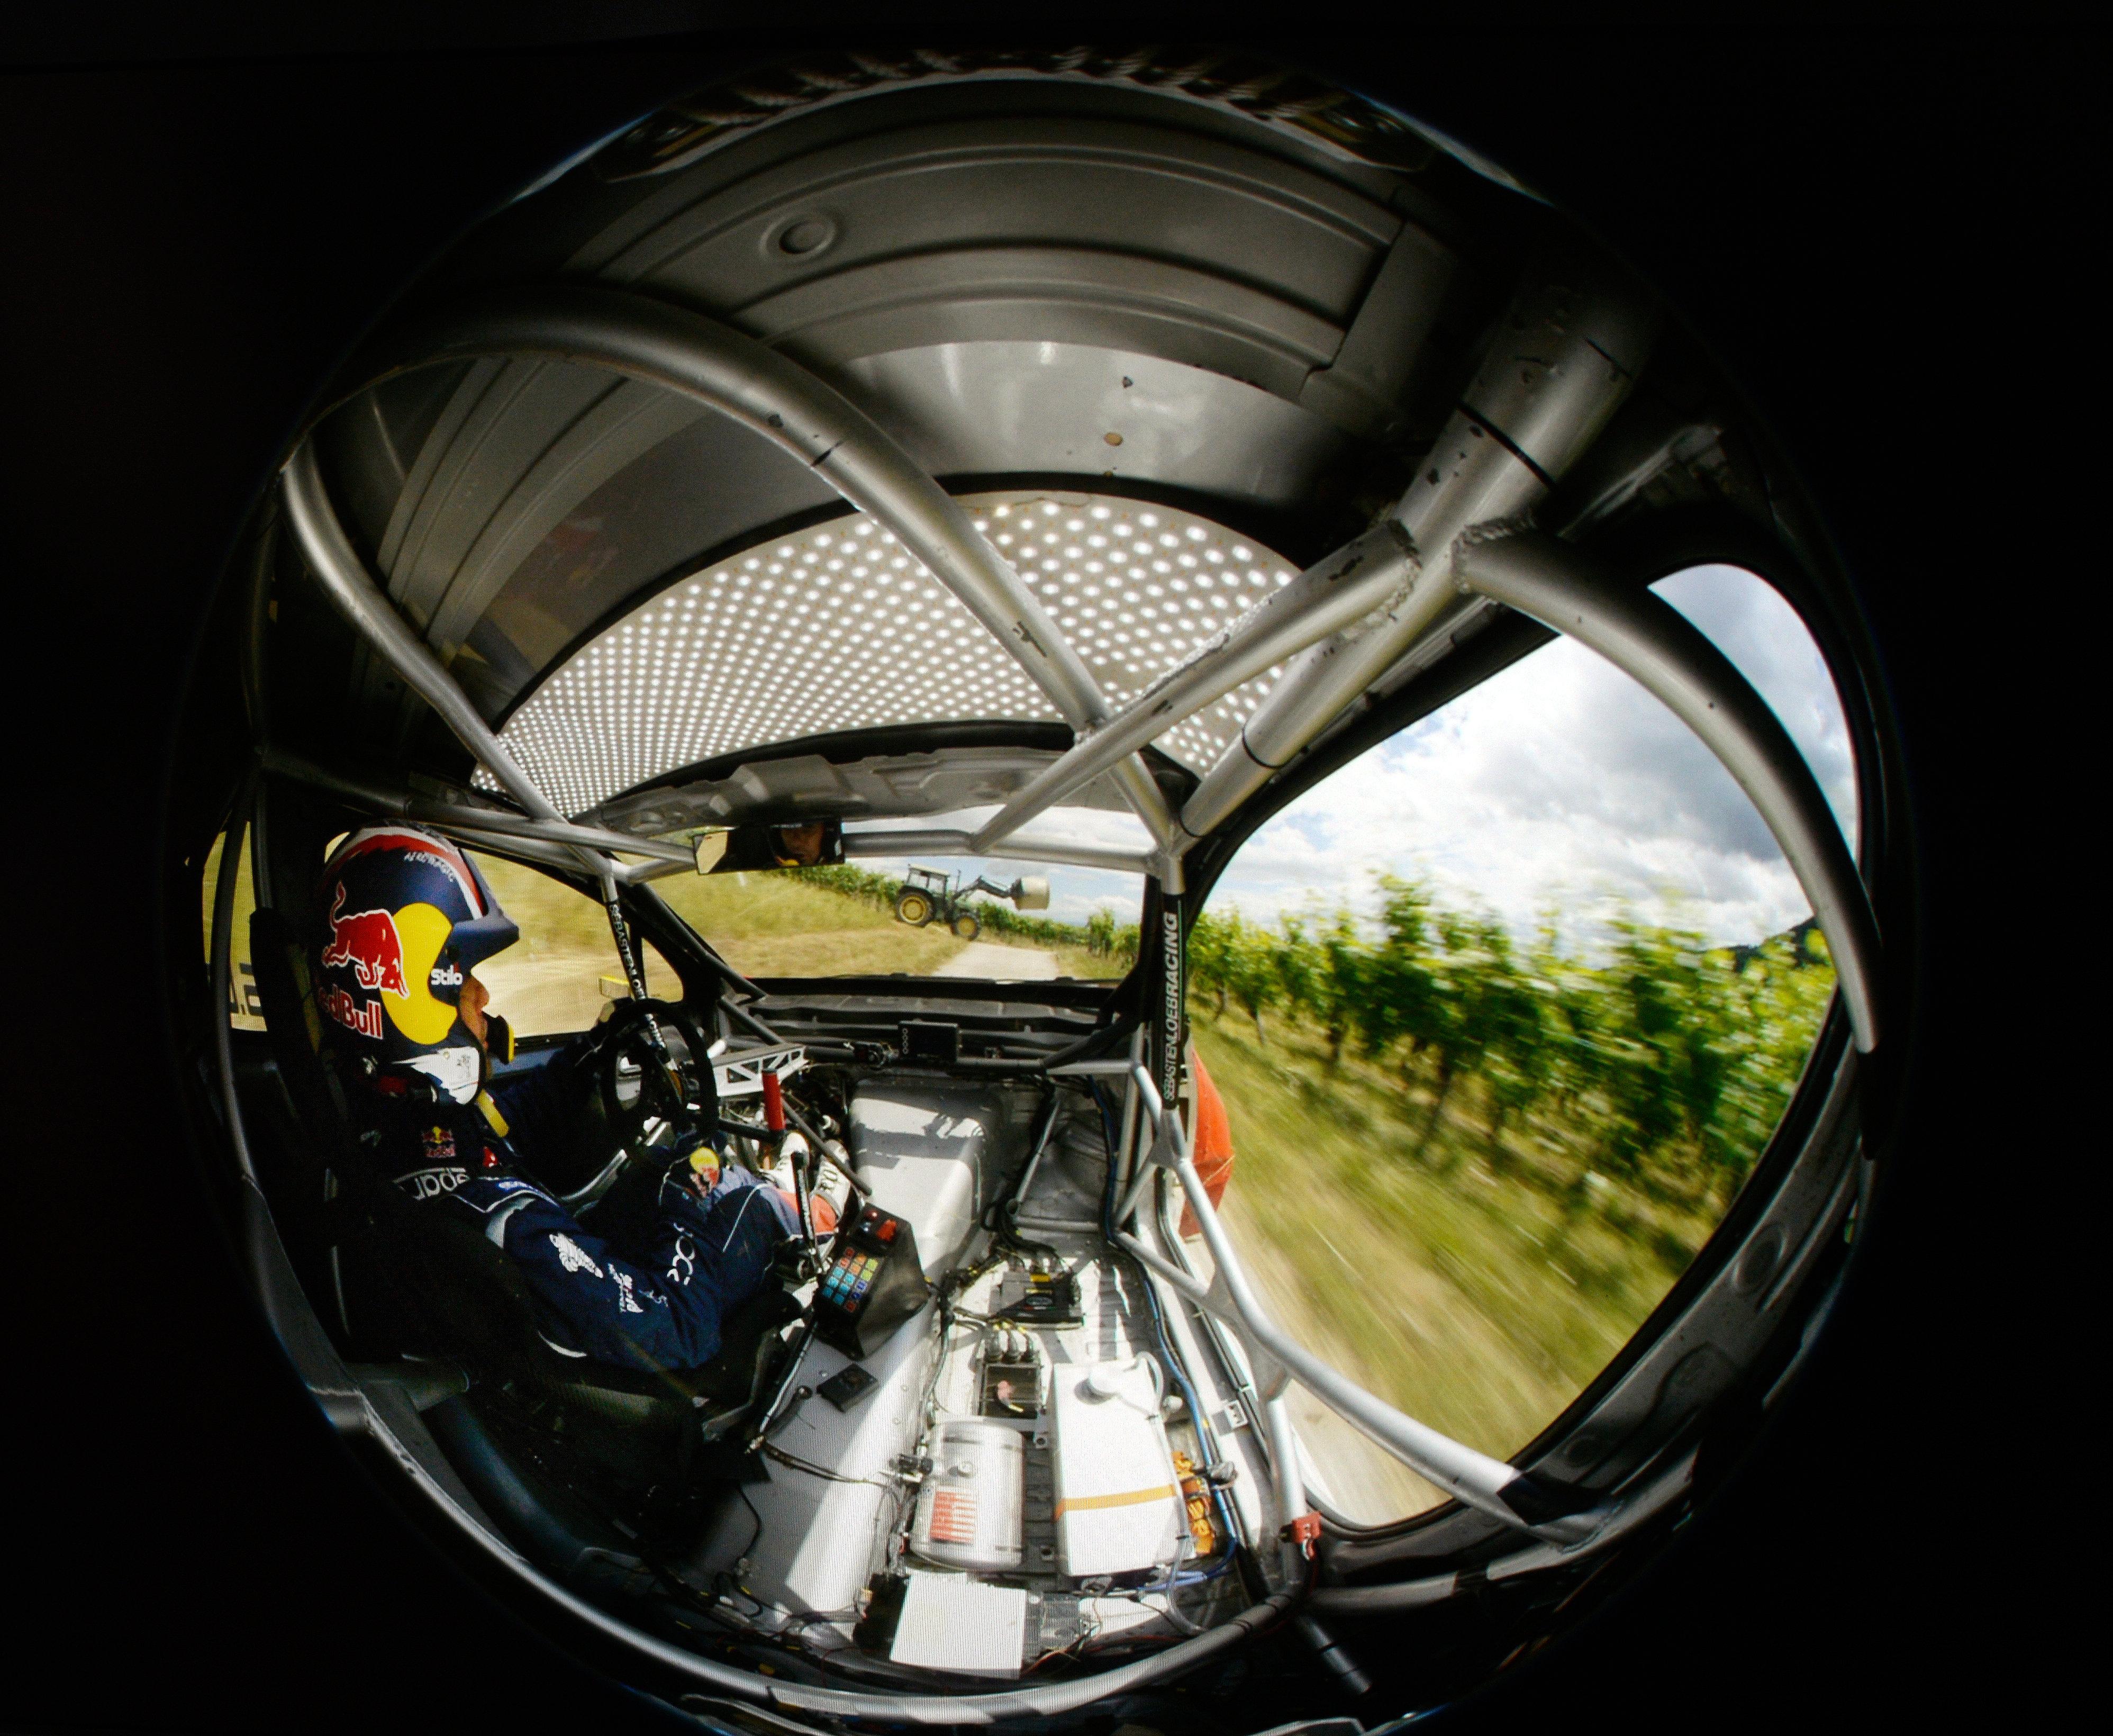 Sébastien Loeb Racing Xperience (pavillon 360°) · avril 2018 - Page 6 620c16f0-9a2b-498d-8a49-b92172504a71